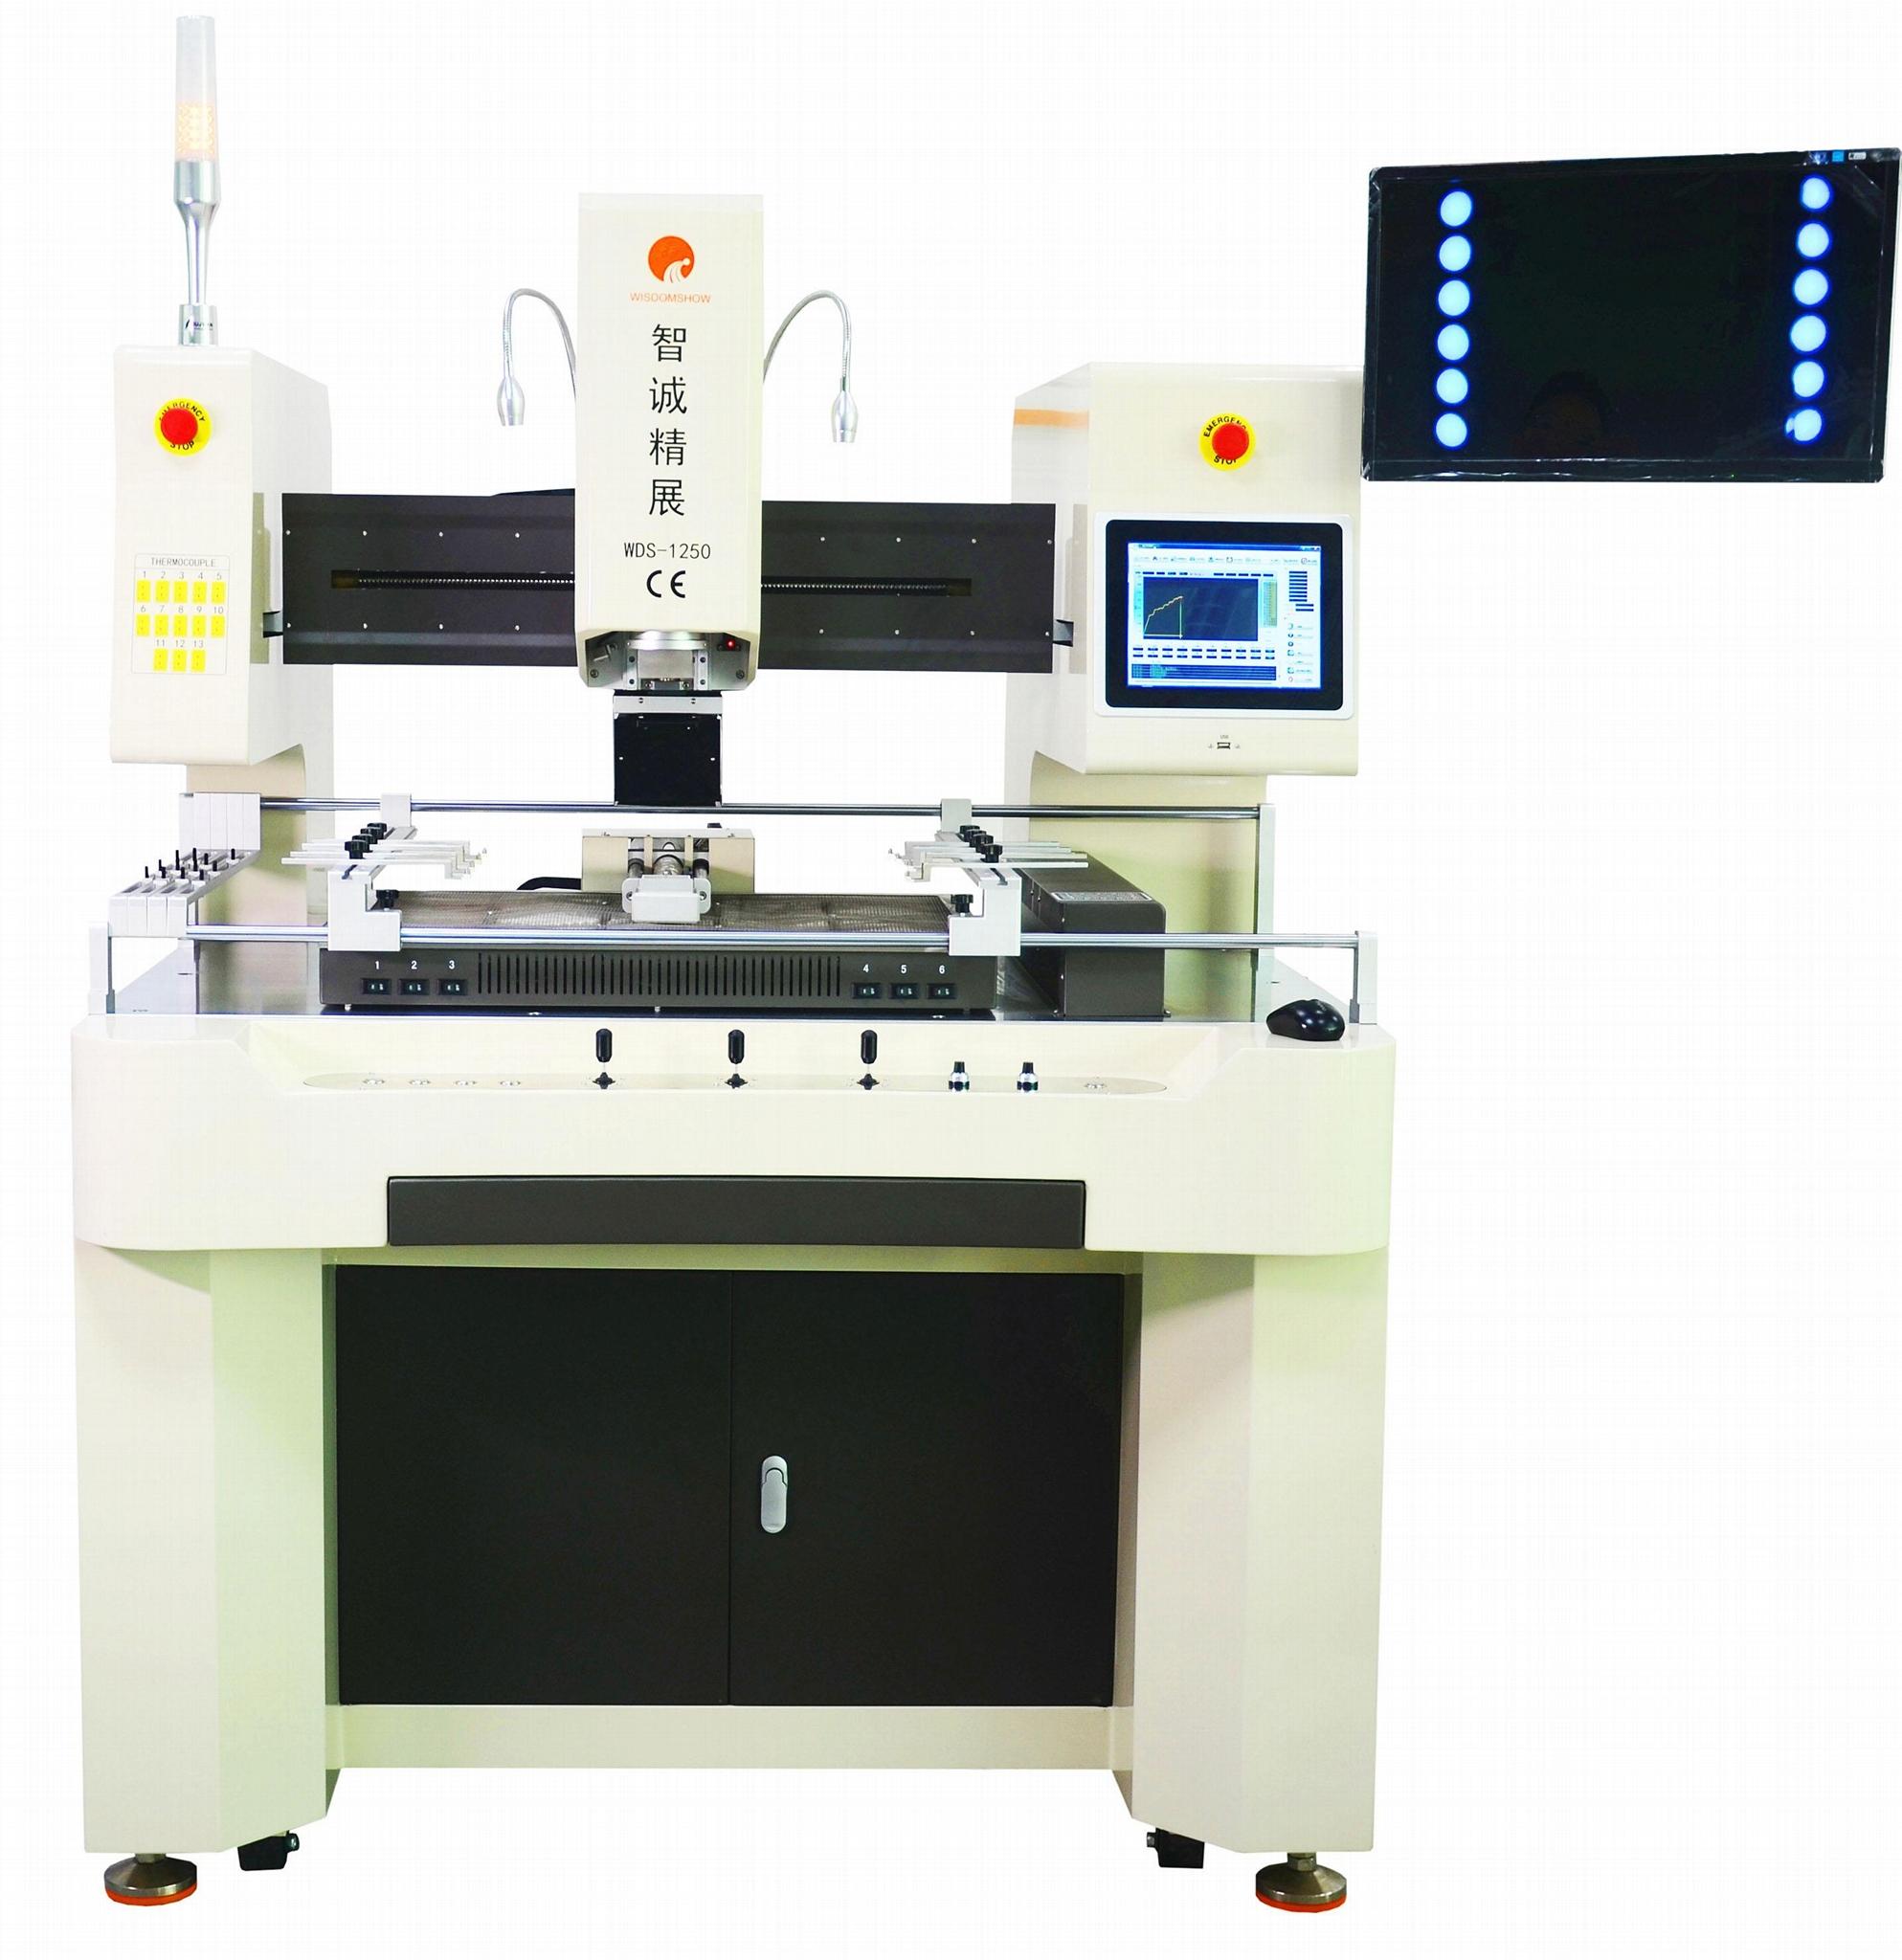 Hot Selling Chipset Replace Machine BGA Rework Station For Motherboard Repair 1